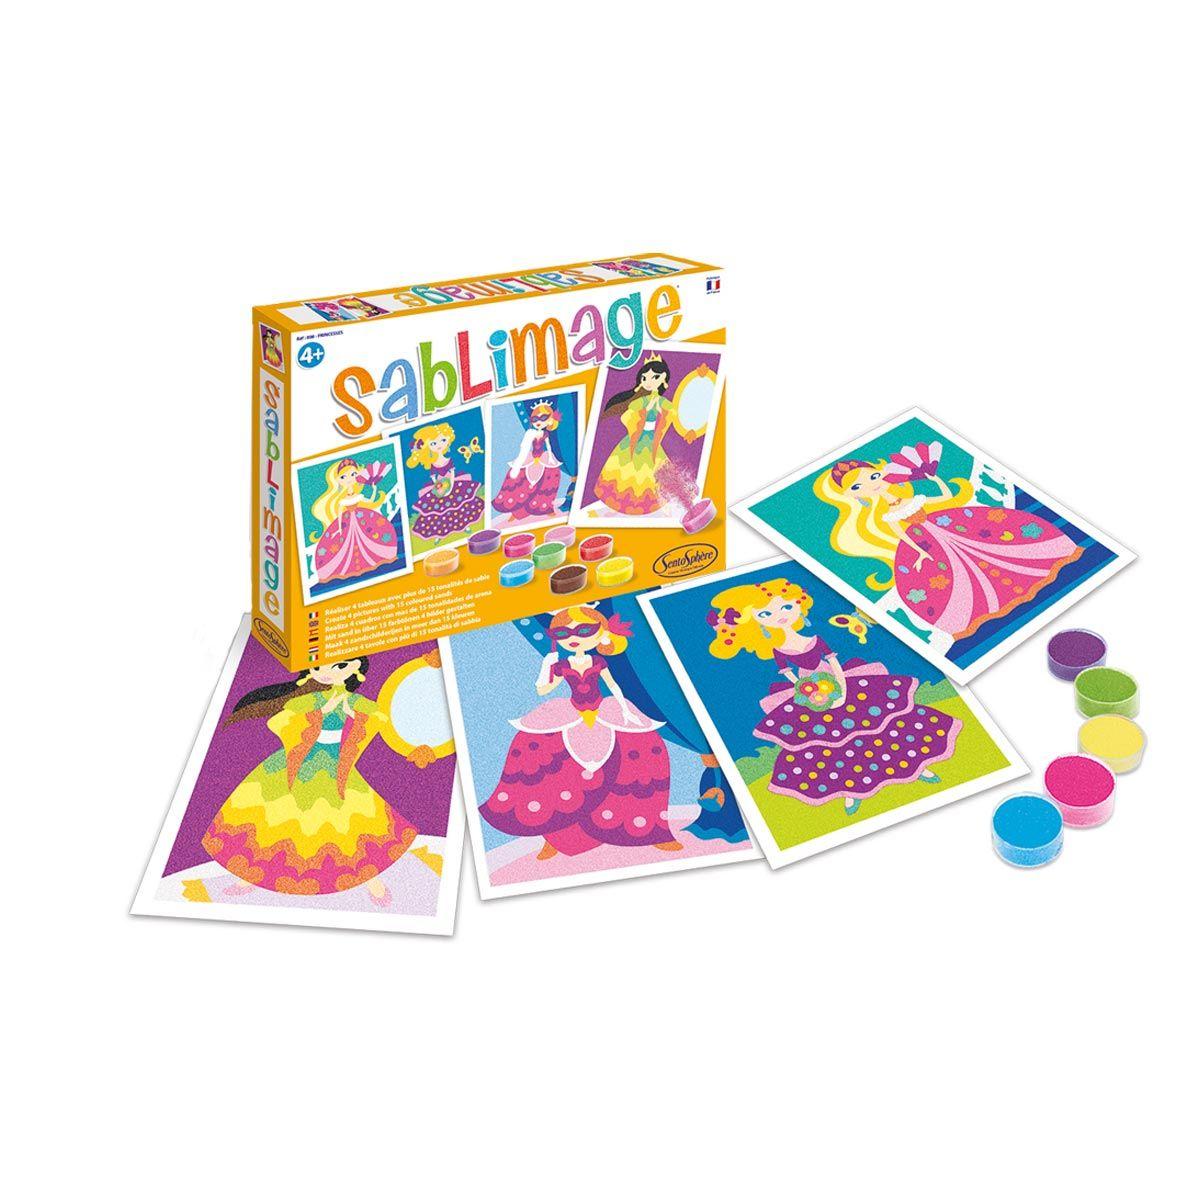 Sablimage Princesses Sentosphere Dessin Princesse Jeux Eveil Jeux Creatif